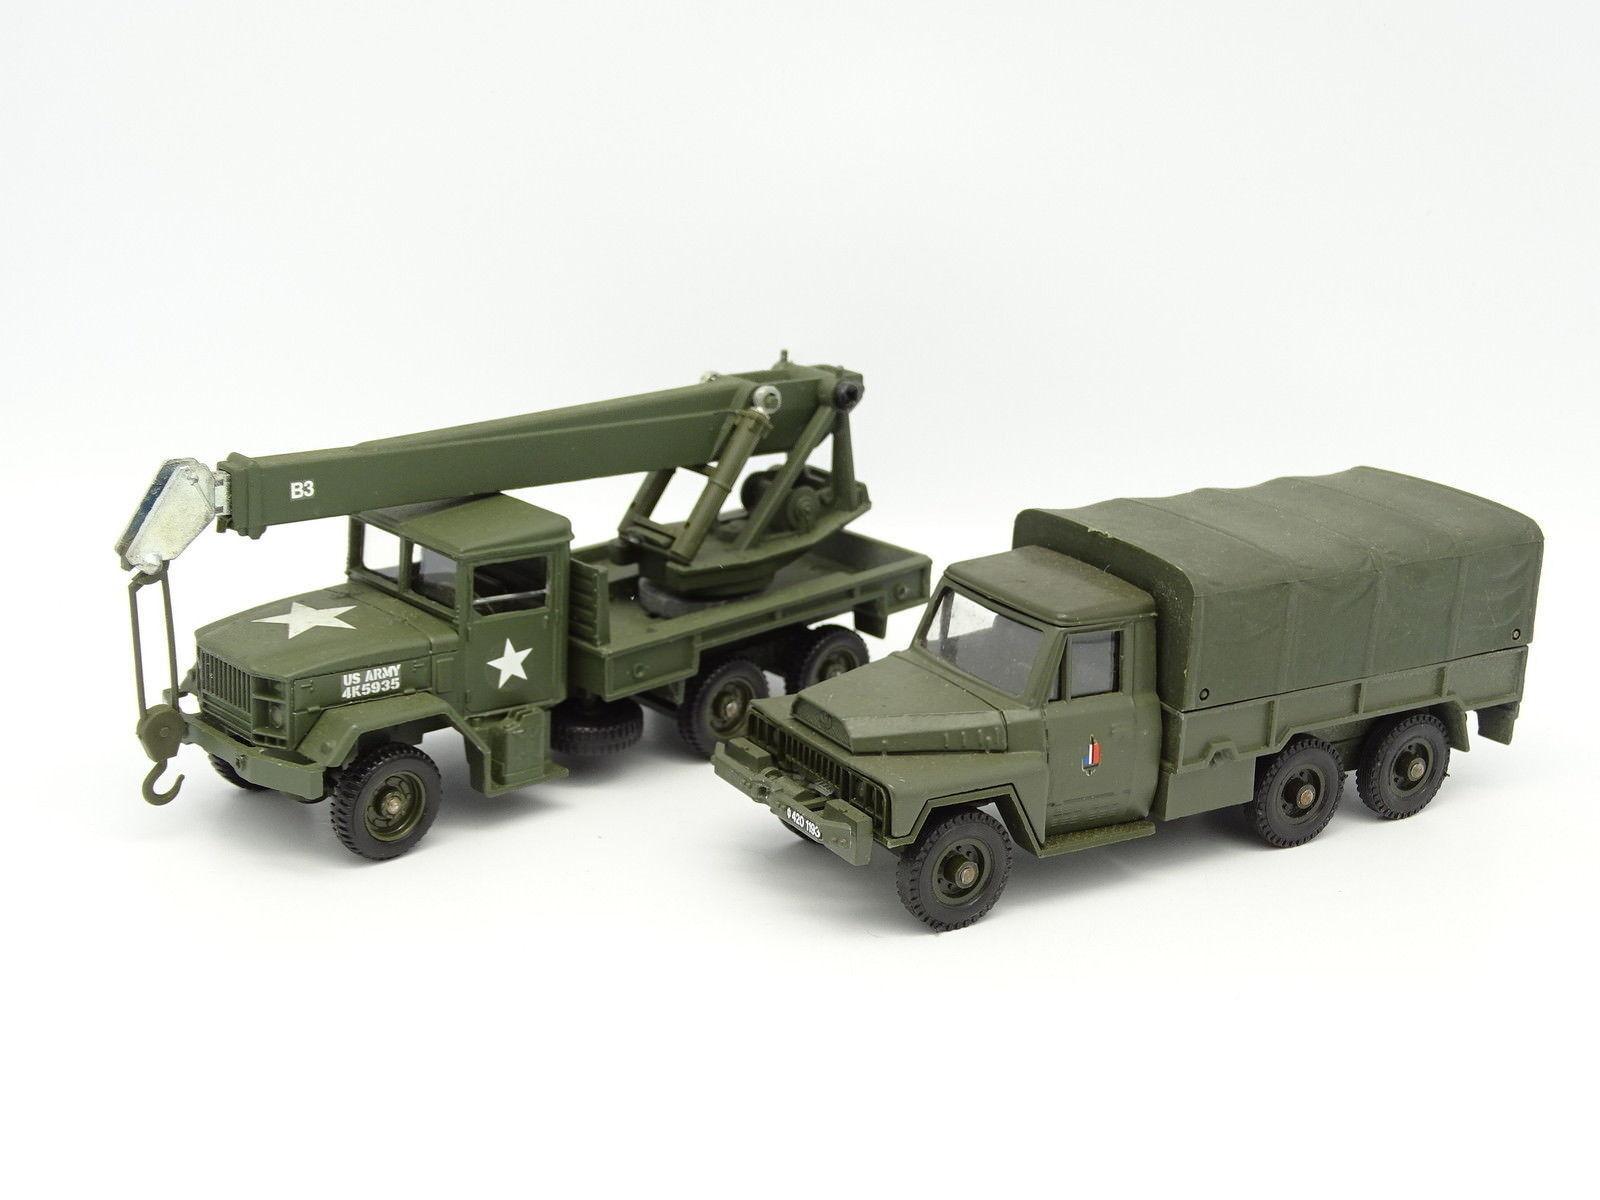 Solido Militär Militär Militär Armee SB 1 50 - 2er Satz   kaiser und acmat 290f10